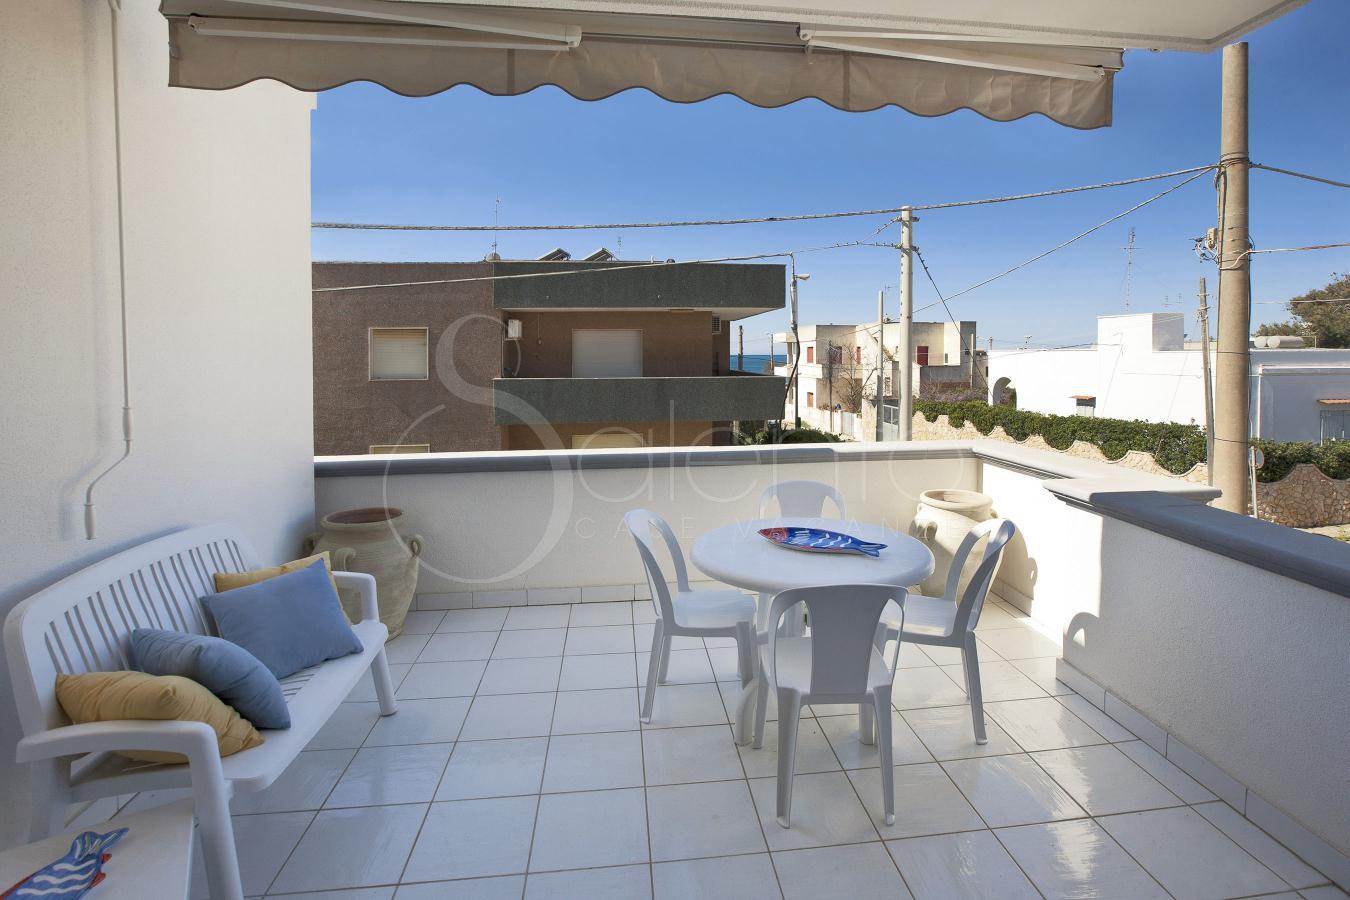 case vacanze - Lido Marini ( Leuca ) - La Suite PP